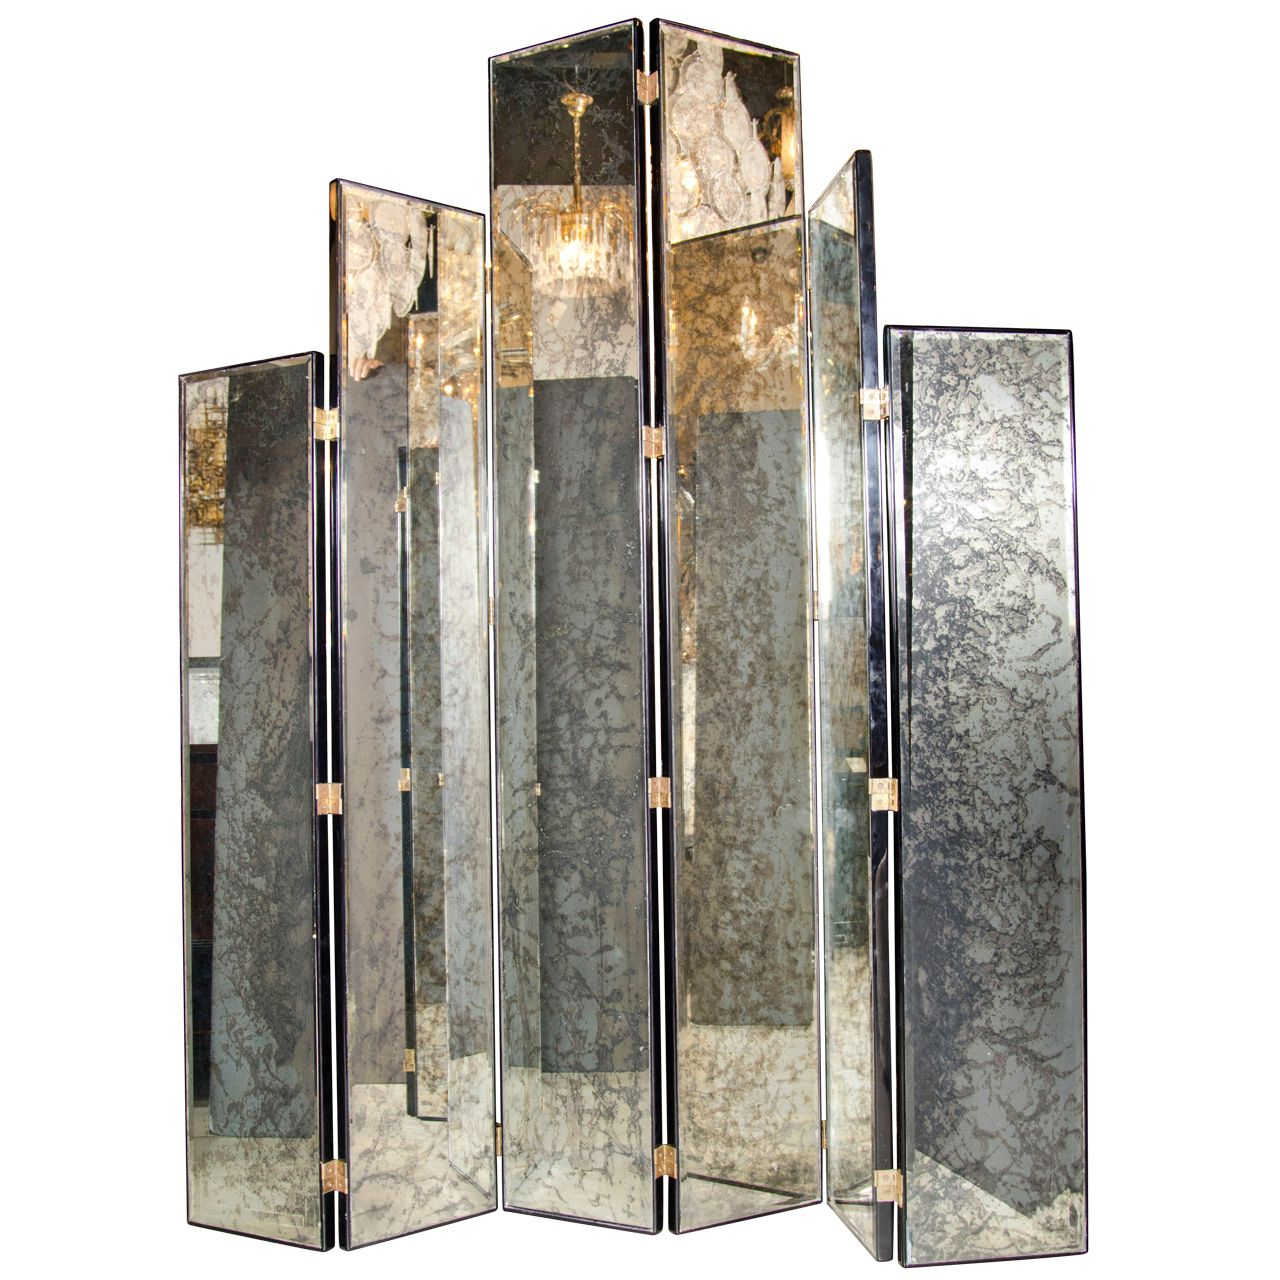 glamourous art deco skyscraper style mirrored screen paravent miroir paravent. Black Bedroom Furniture Sets. Home Design Ideas